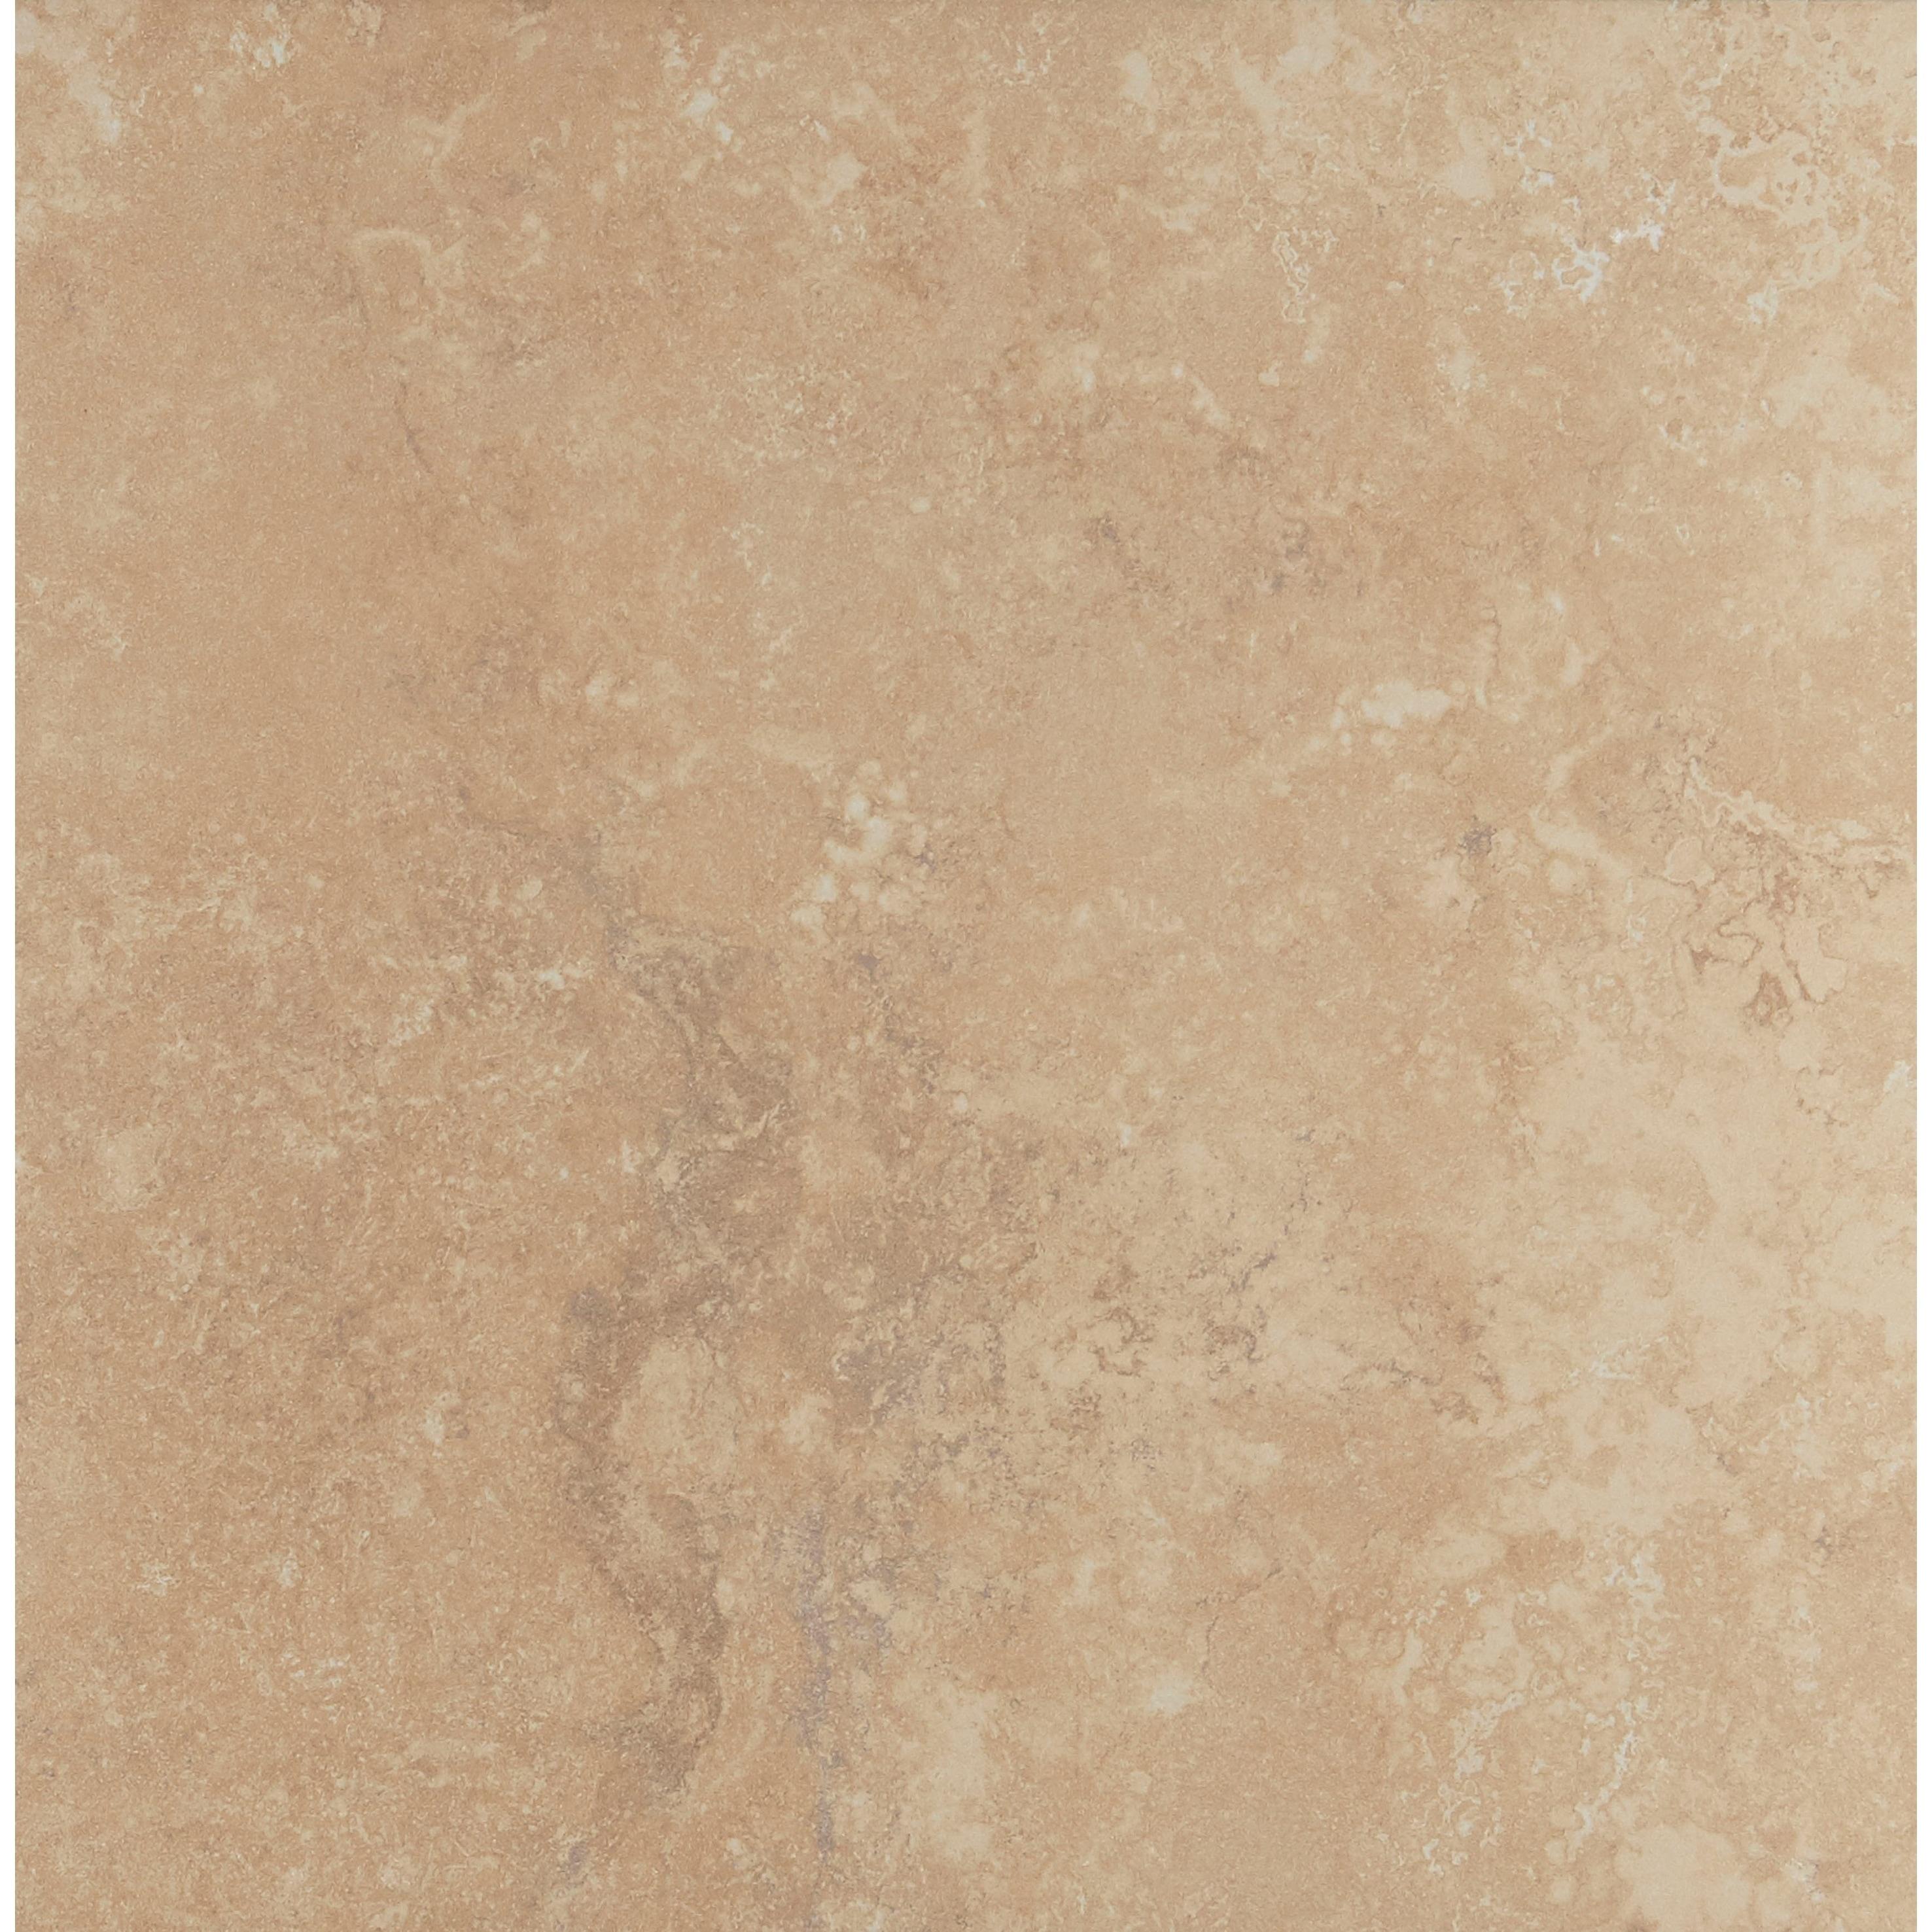 Shop Natural Stone Visual 18x18 Inch Ceramic Floor Tile In Acacia